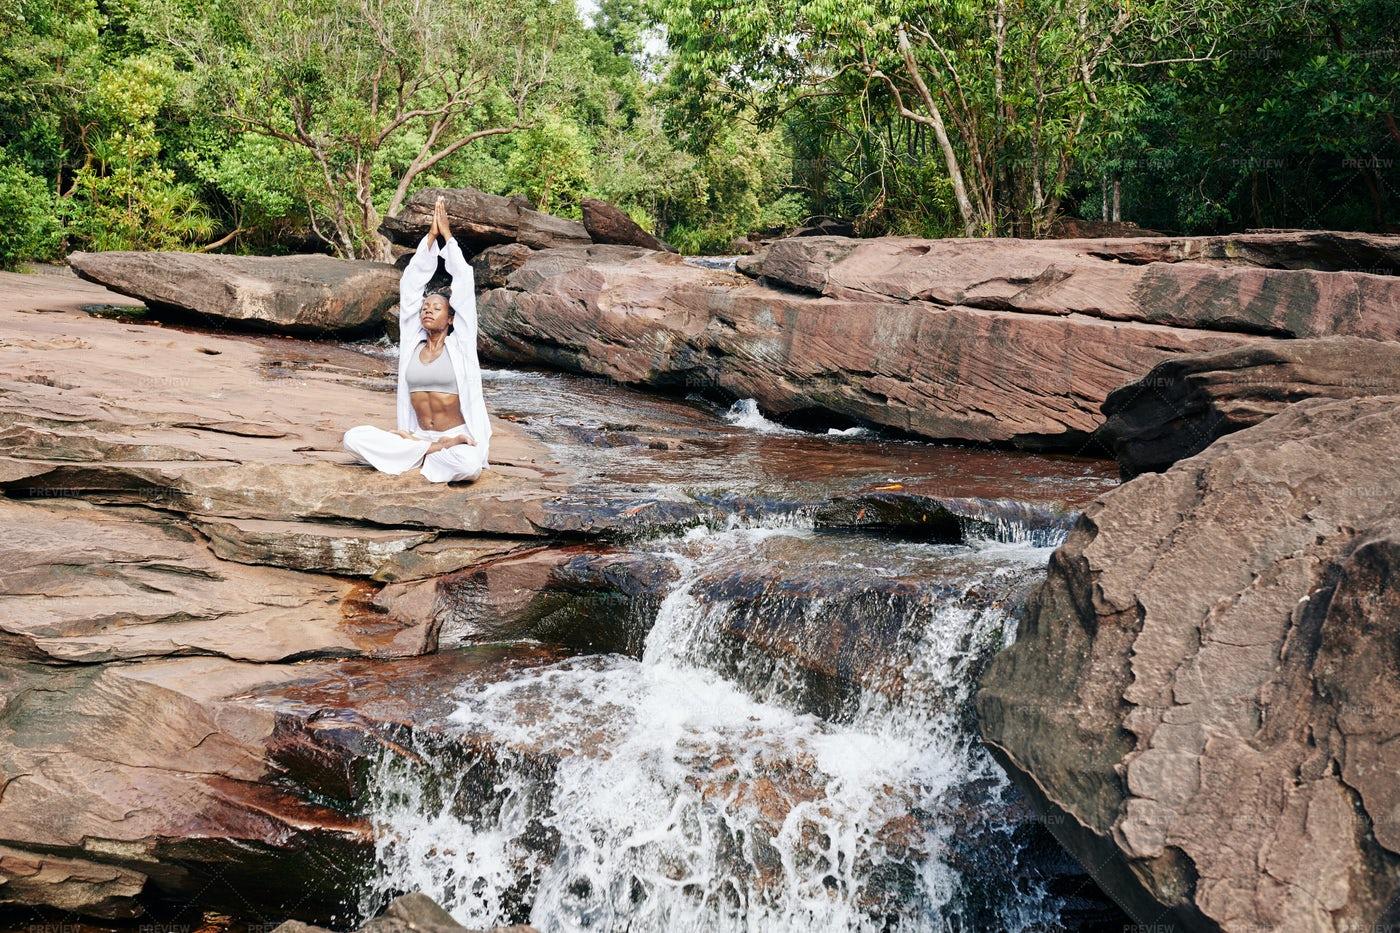 Woman Meditating In Nature: Stock Photos